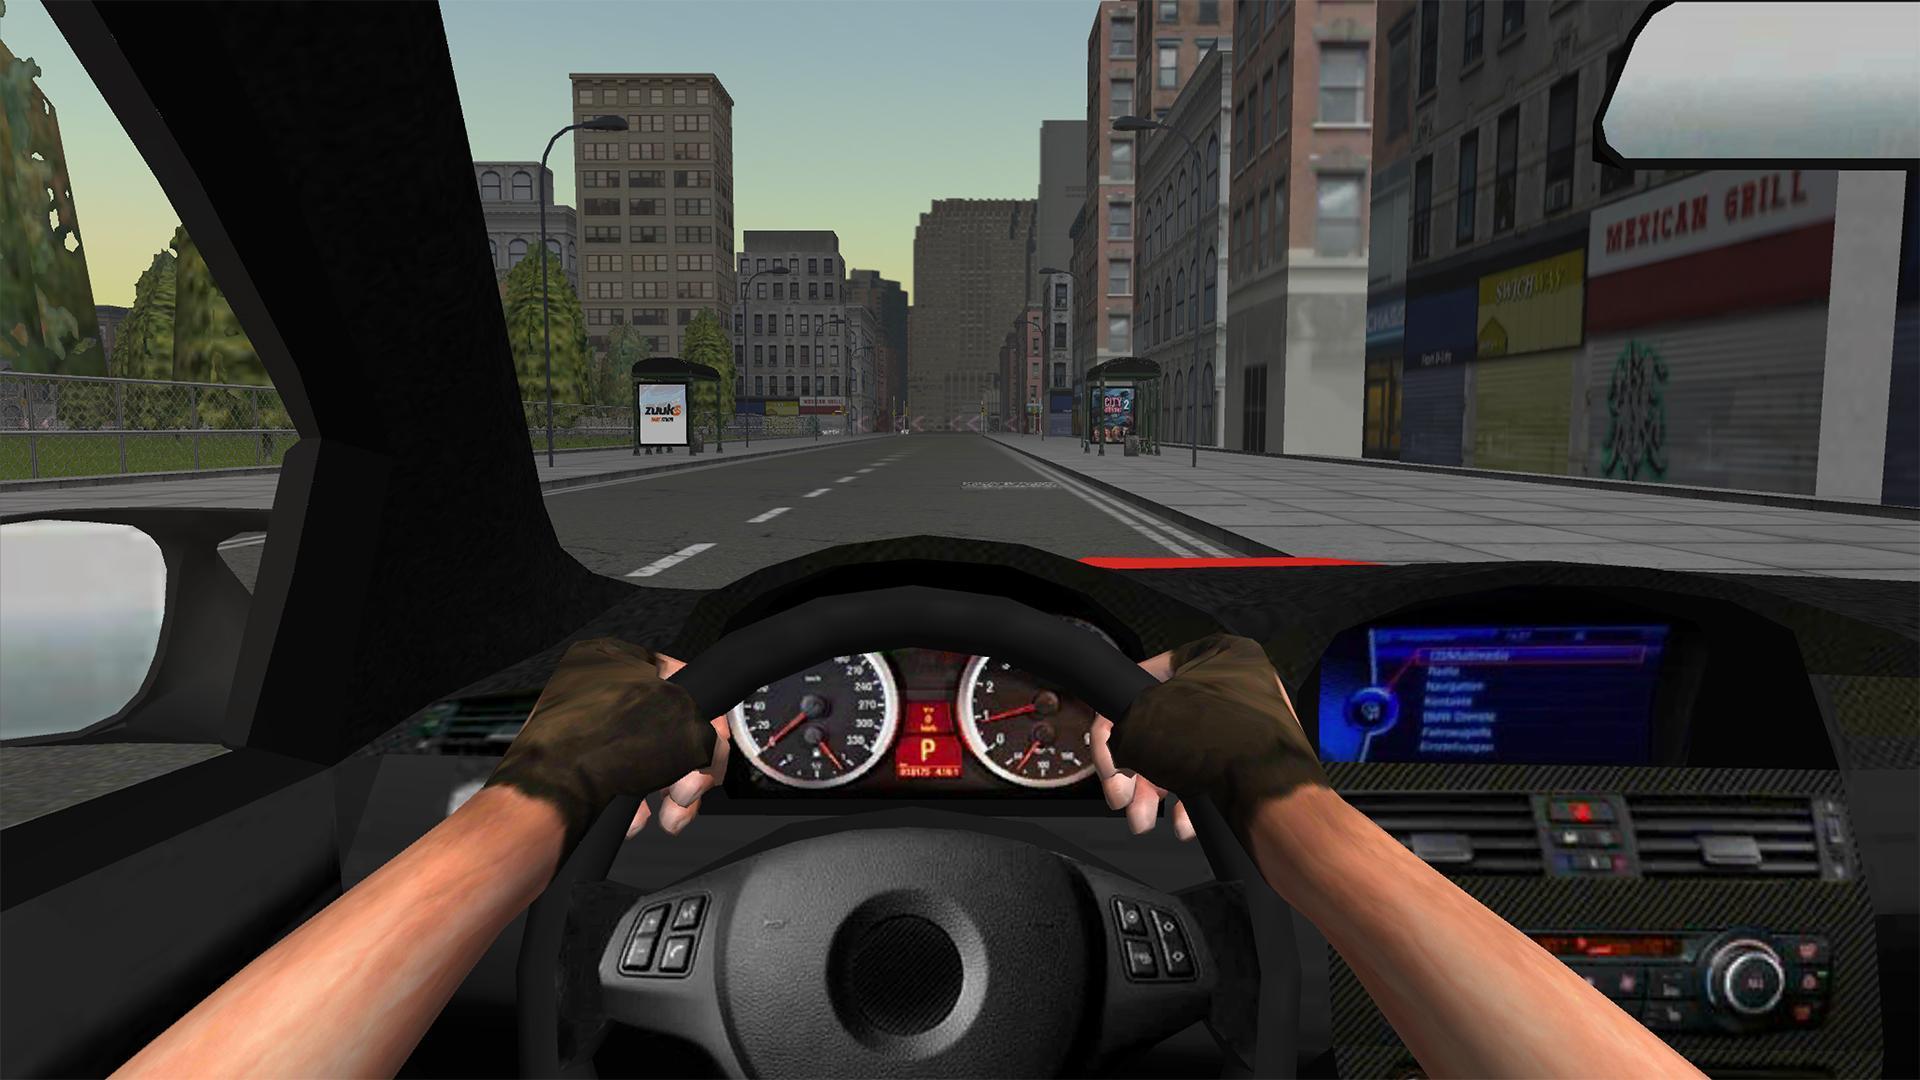 Free city driver 2 games addicting games car london bus parking 2